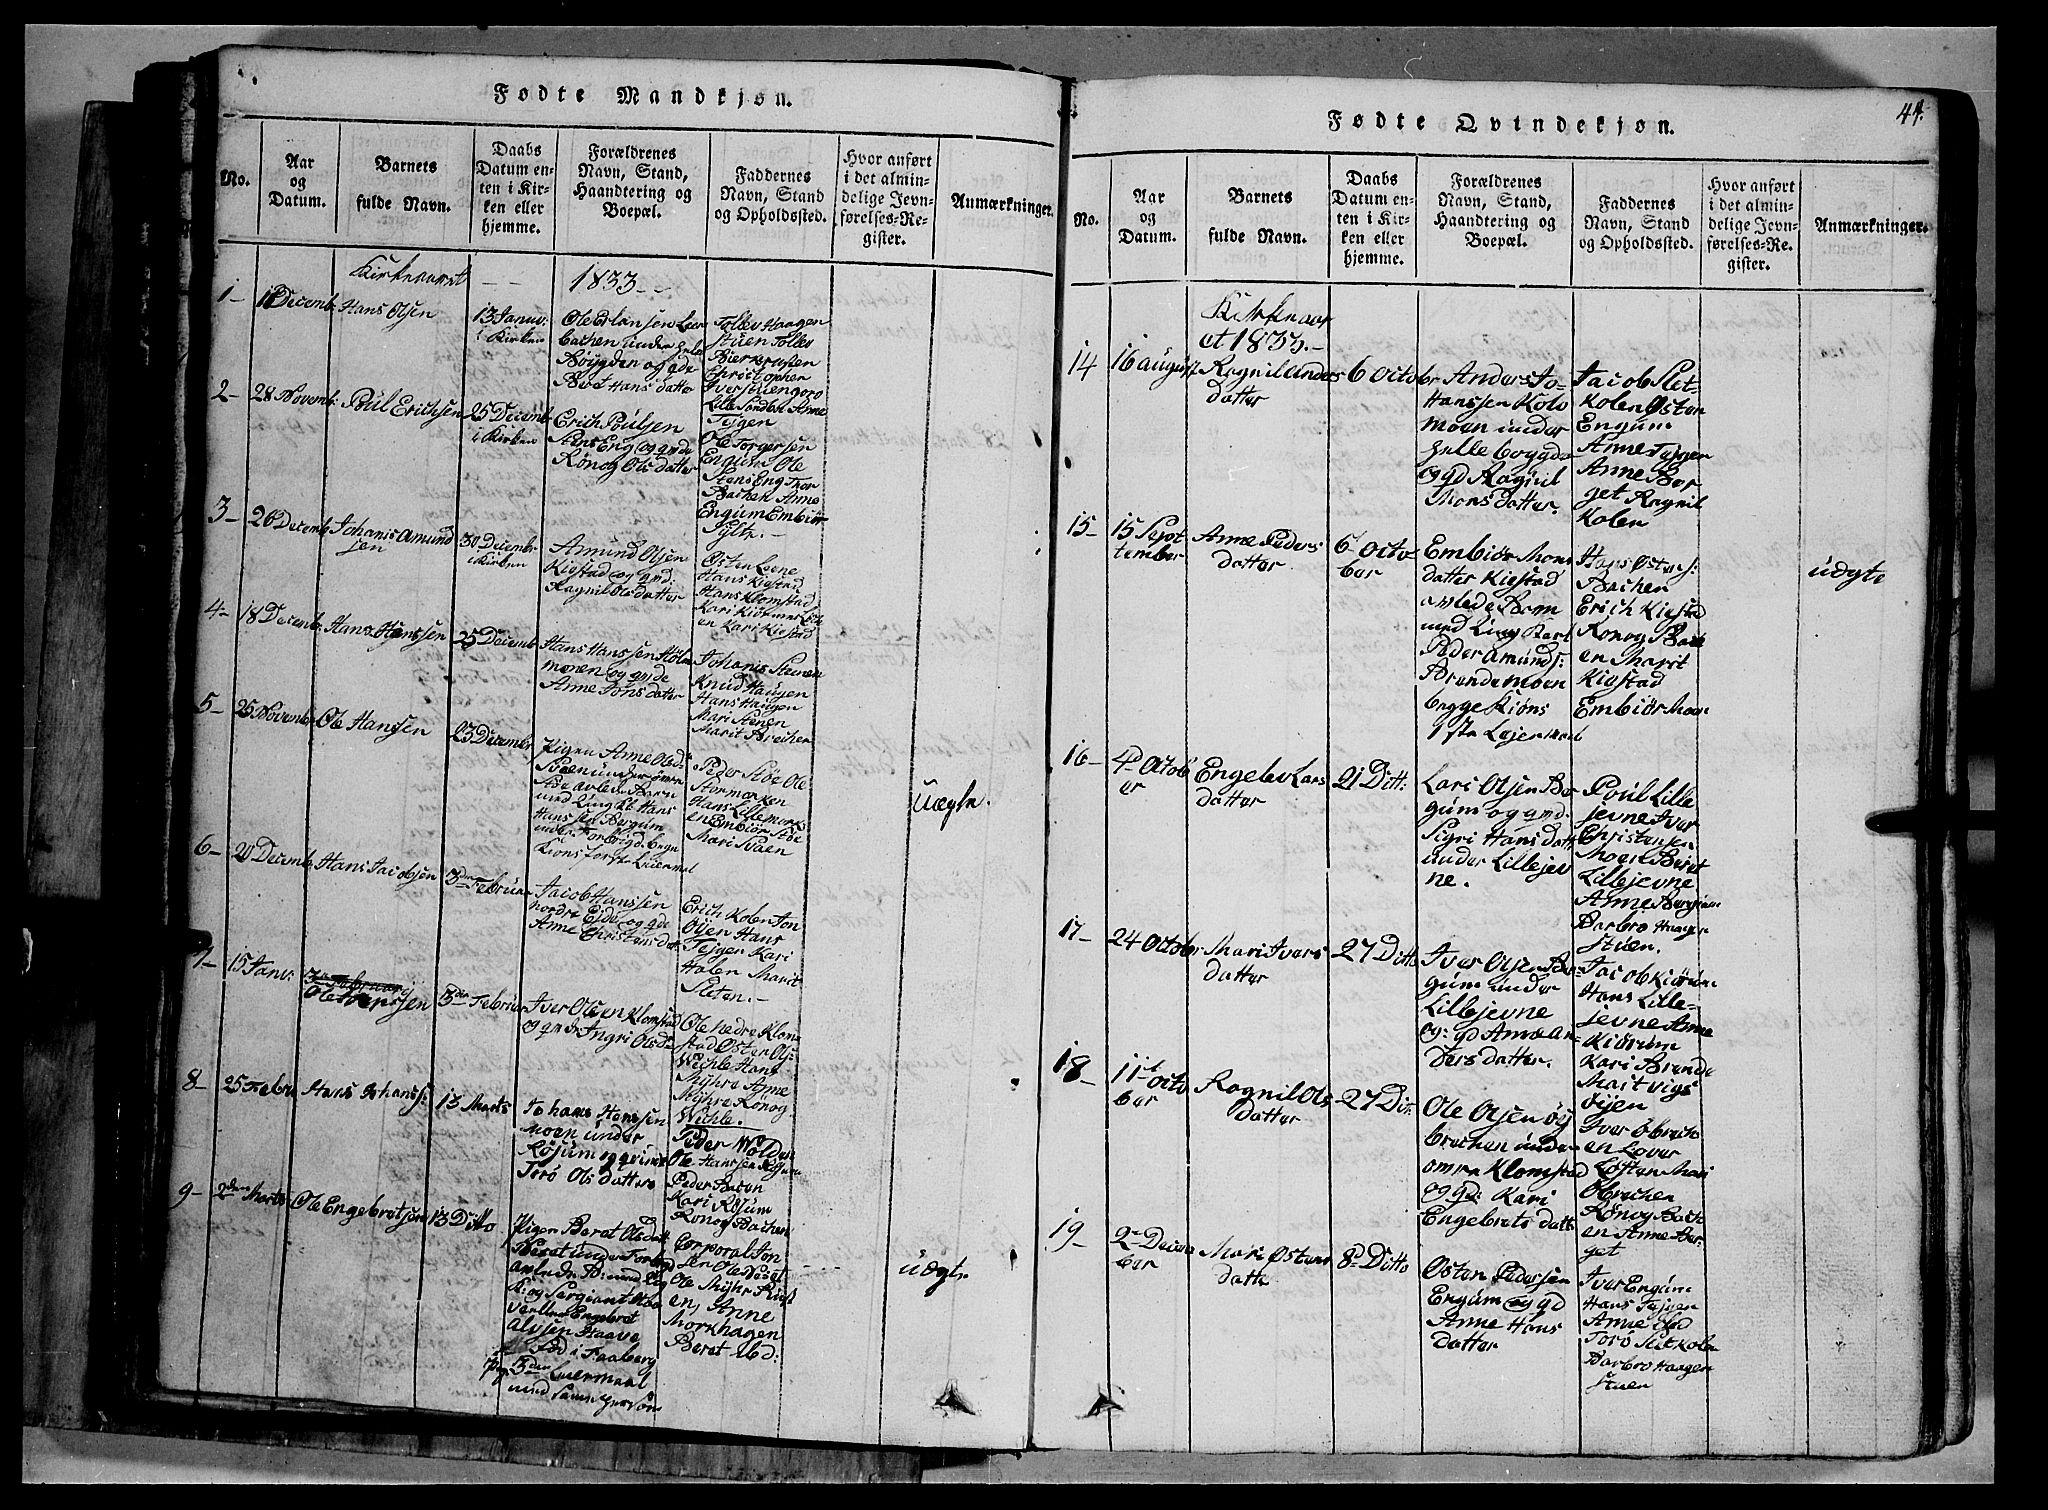 SAH, Fron prestekontor, H/Ha/Hab/L0002: Klokkerbok nr. 2, 1816-1850, s. 44